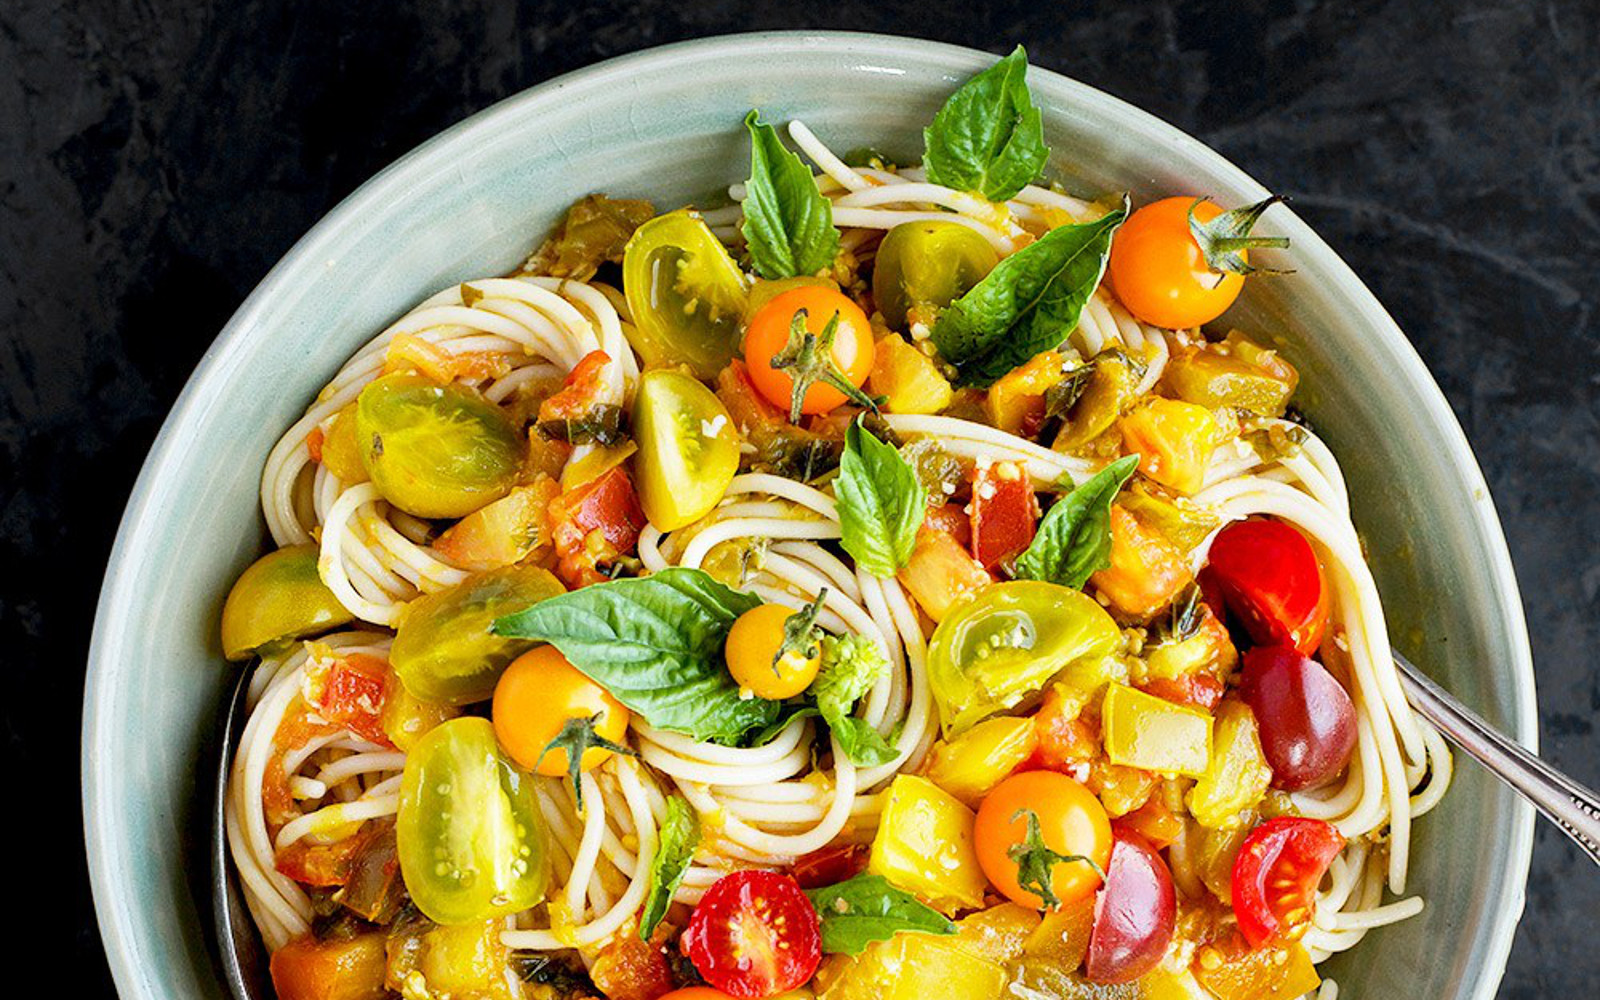 Vegan Gluten-Free Heirloom Tomato and Basil Wine Sauce Over Pasta